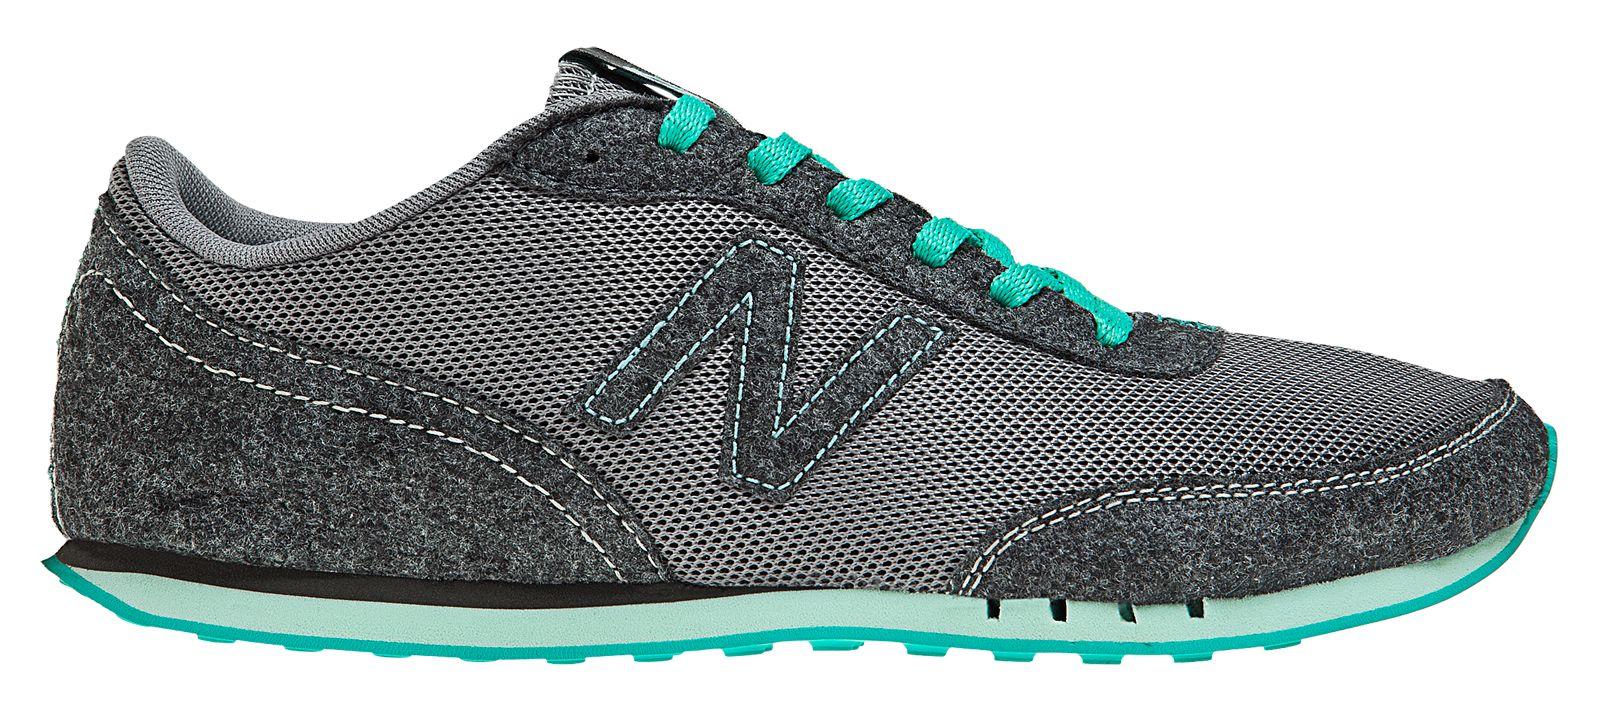 Women\u0027s Walking Shoes   New Balance Walking Shoes Up to 70% Off   Joe\u0027s  Official New Balance Outlet